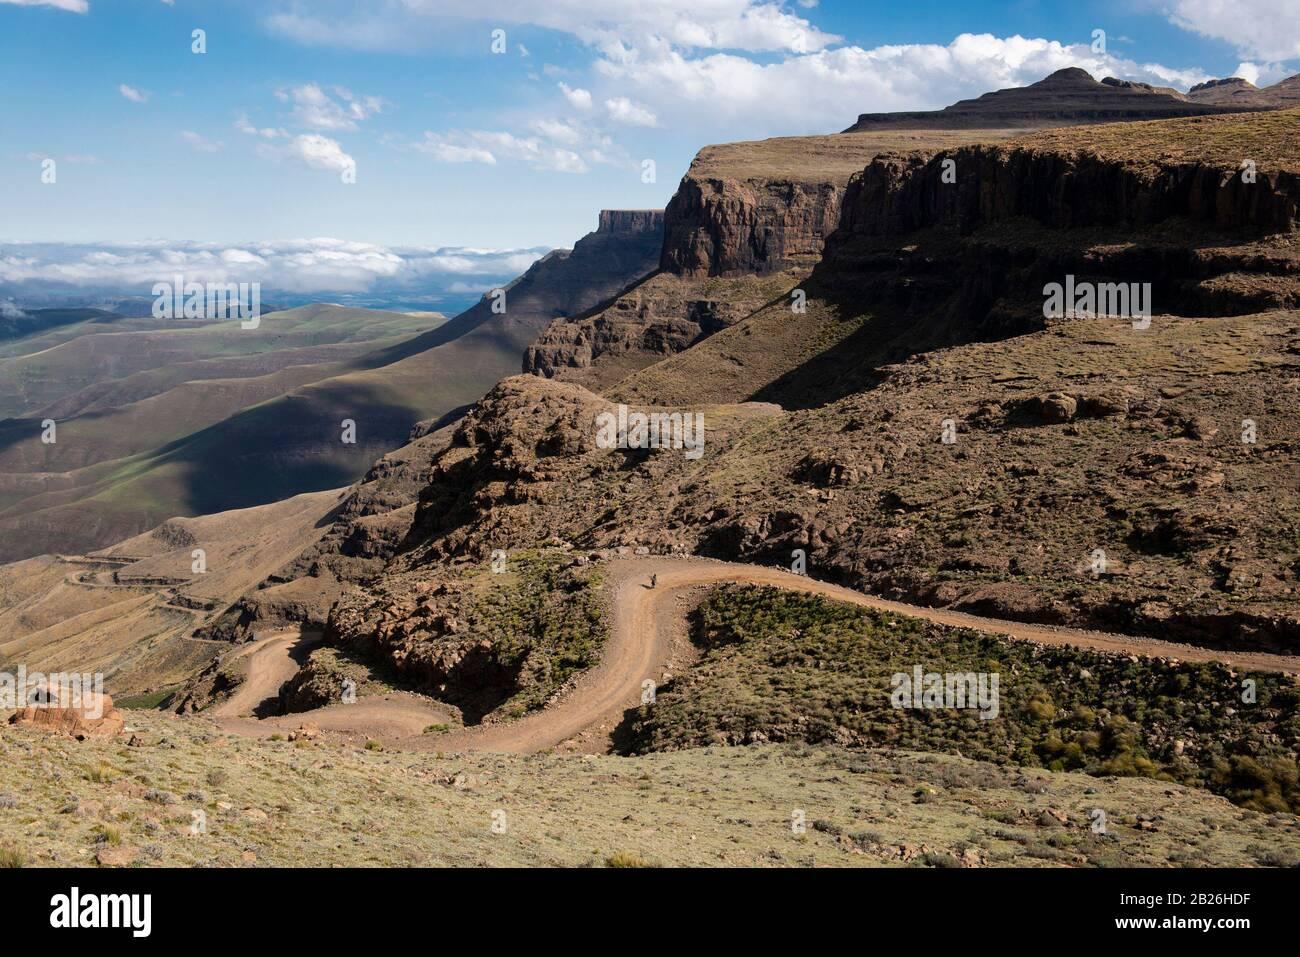 Basotho llevando madera hasta Sani Pass, Lesotho Foto de stock